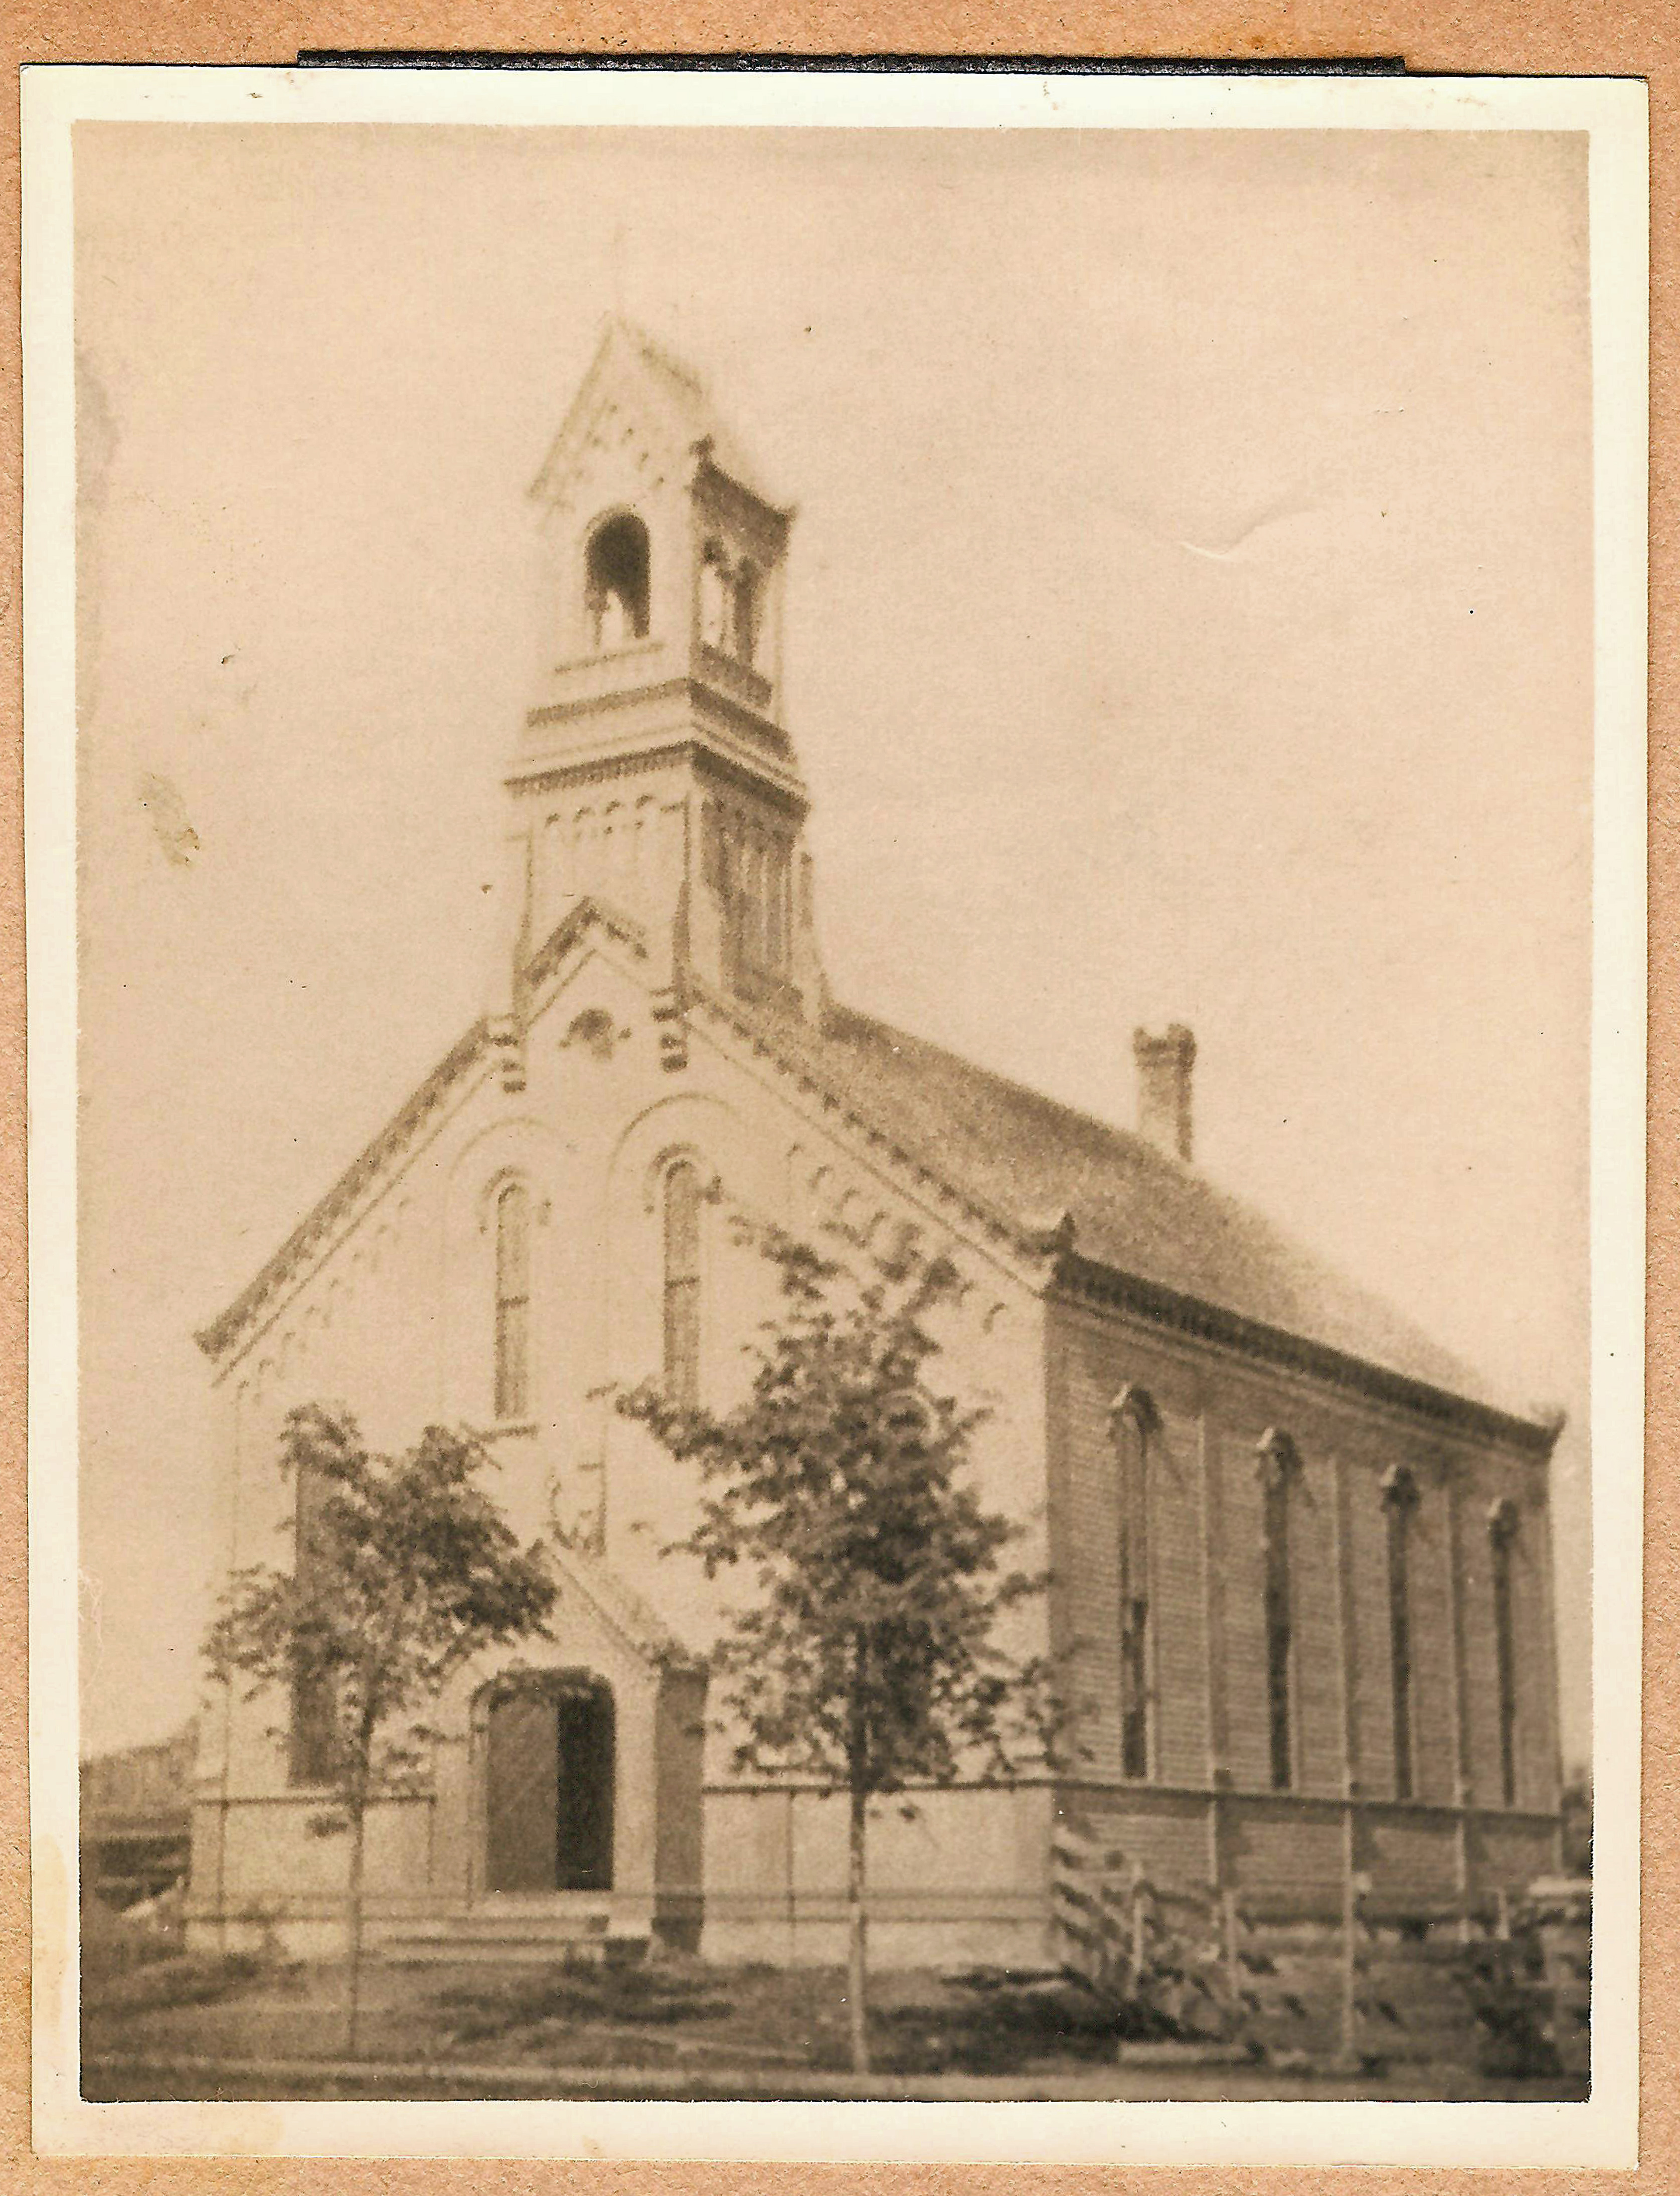 Court Street Baptist 1865